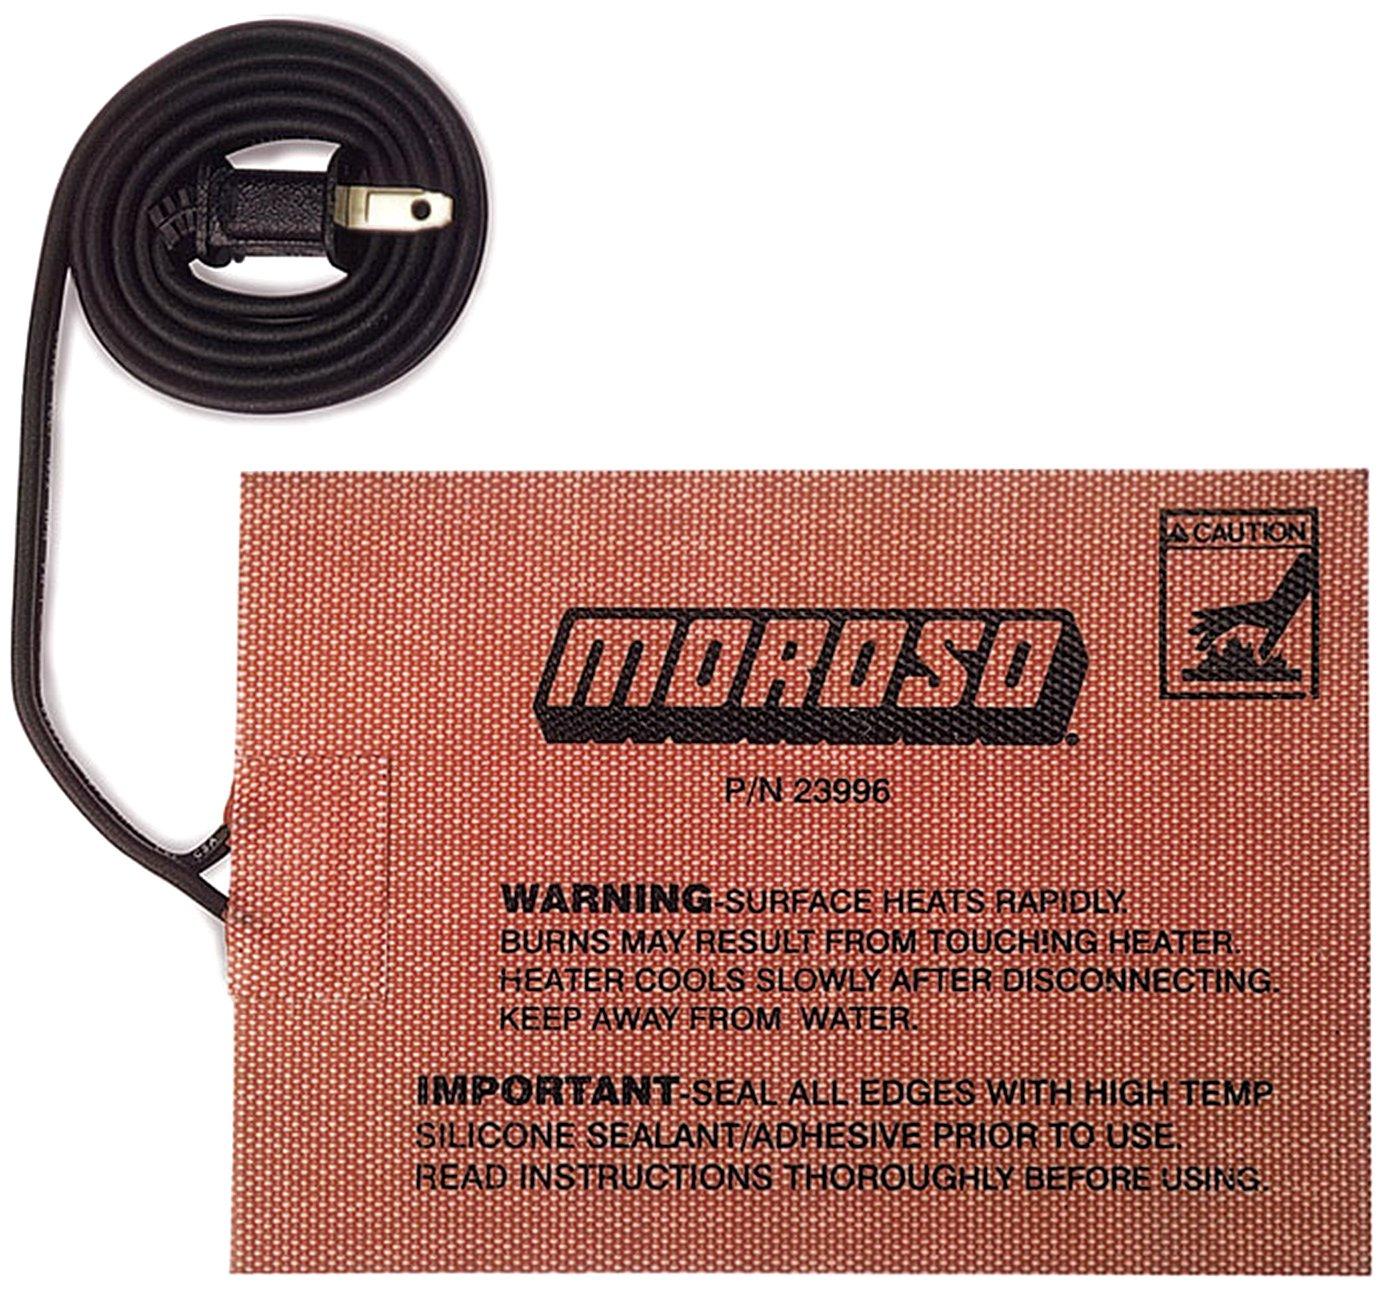 Moroso 23996 5' x 7' Self Adhesive External Heating Pad